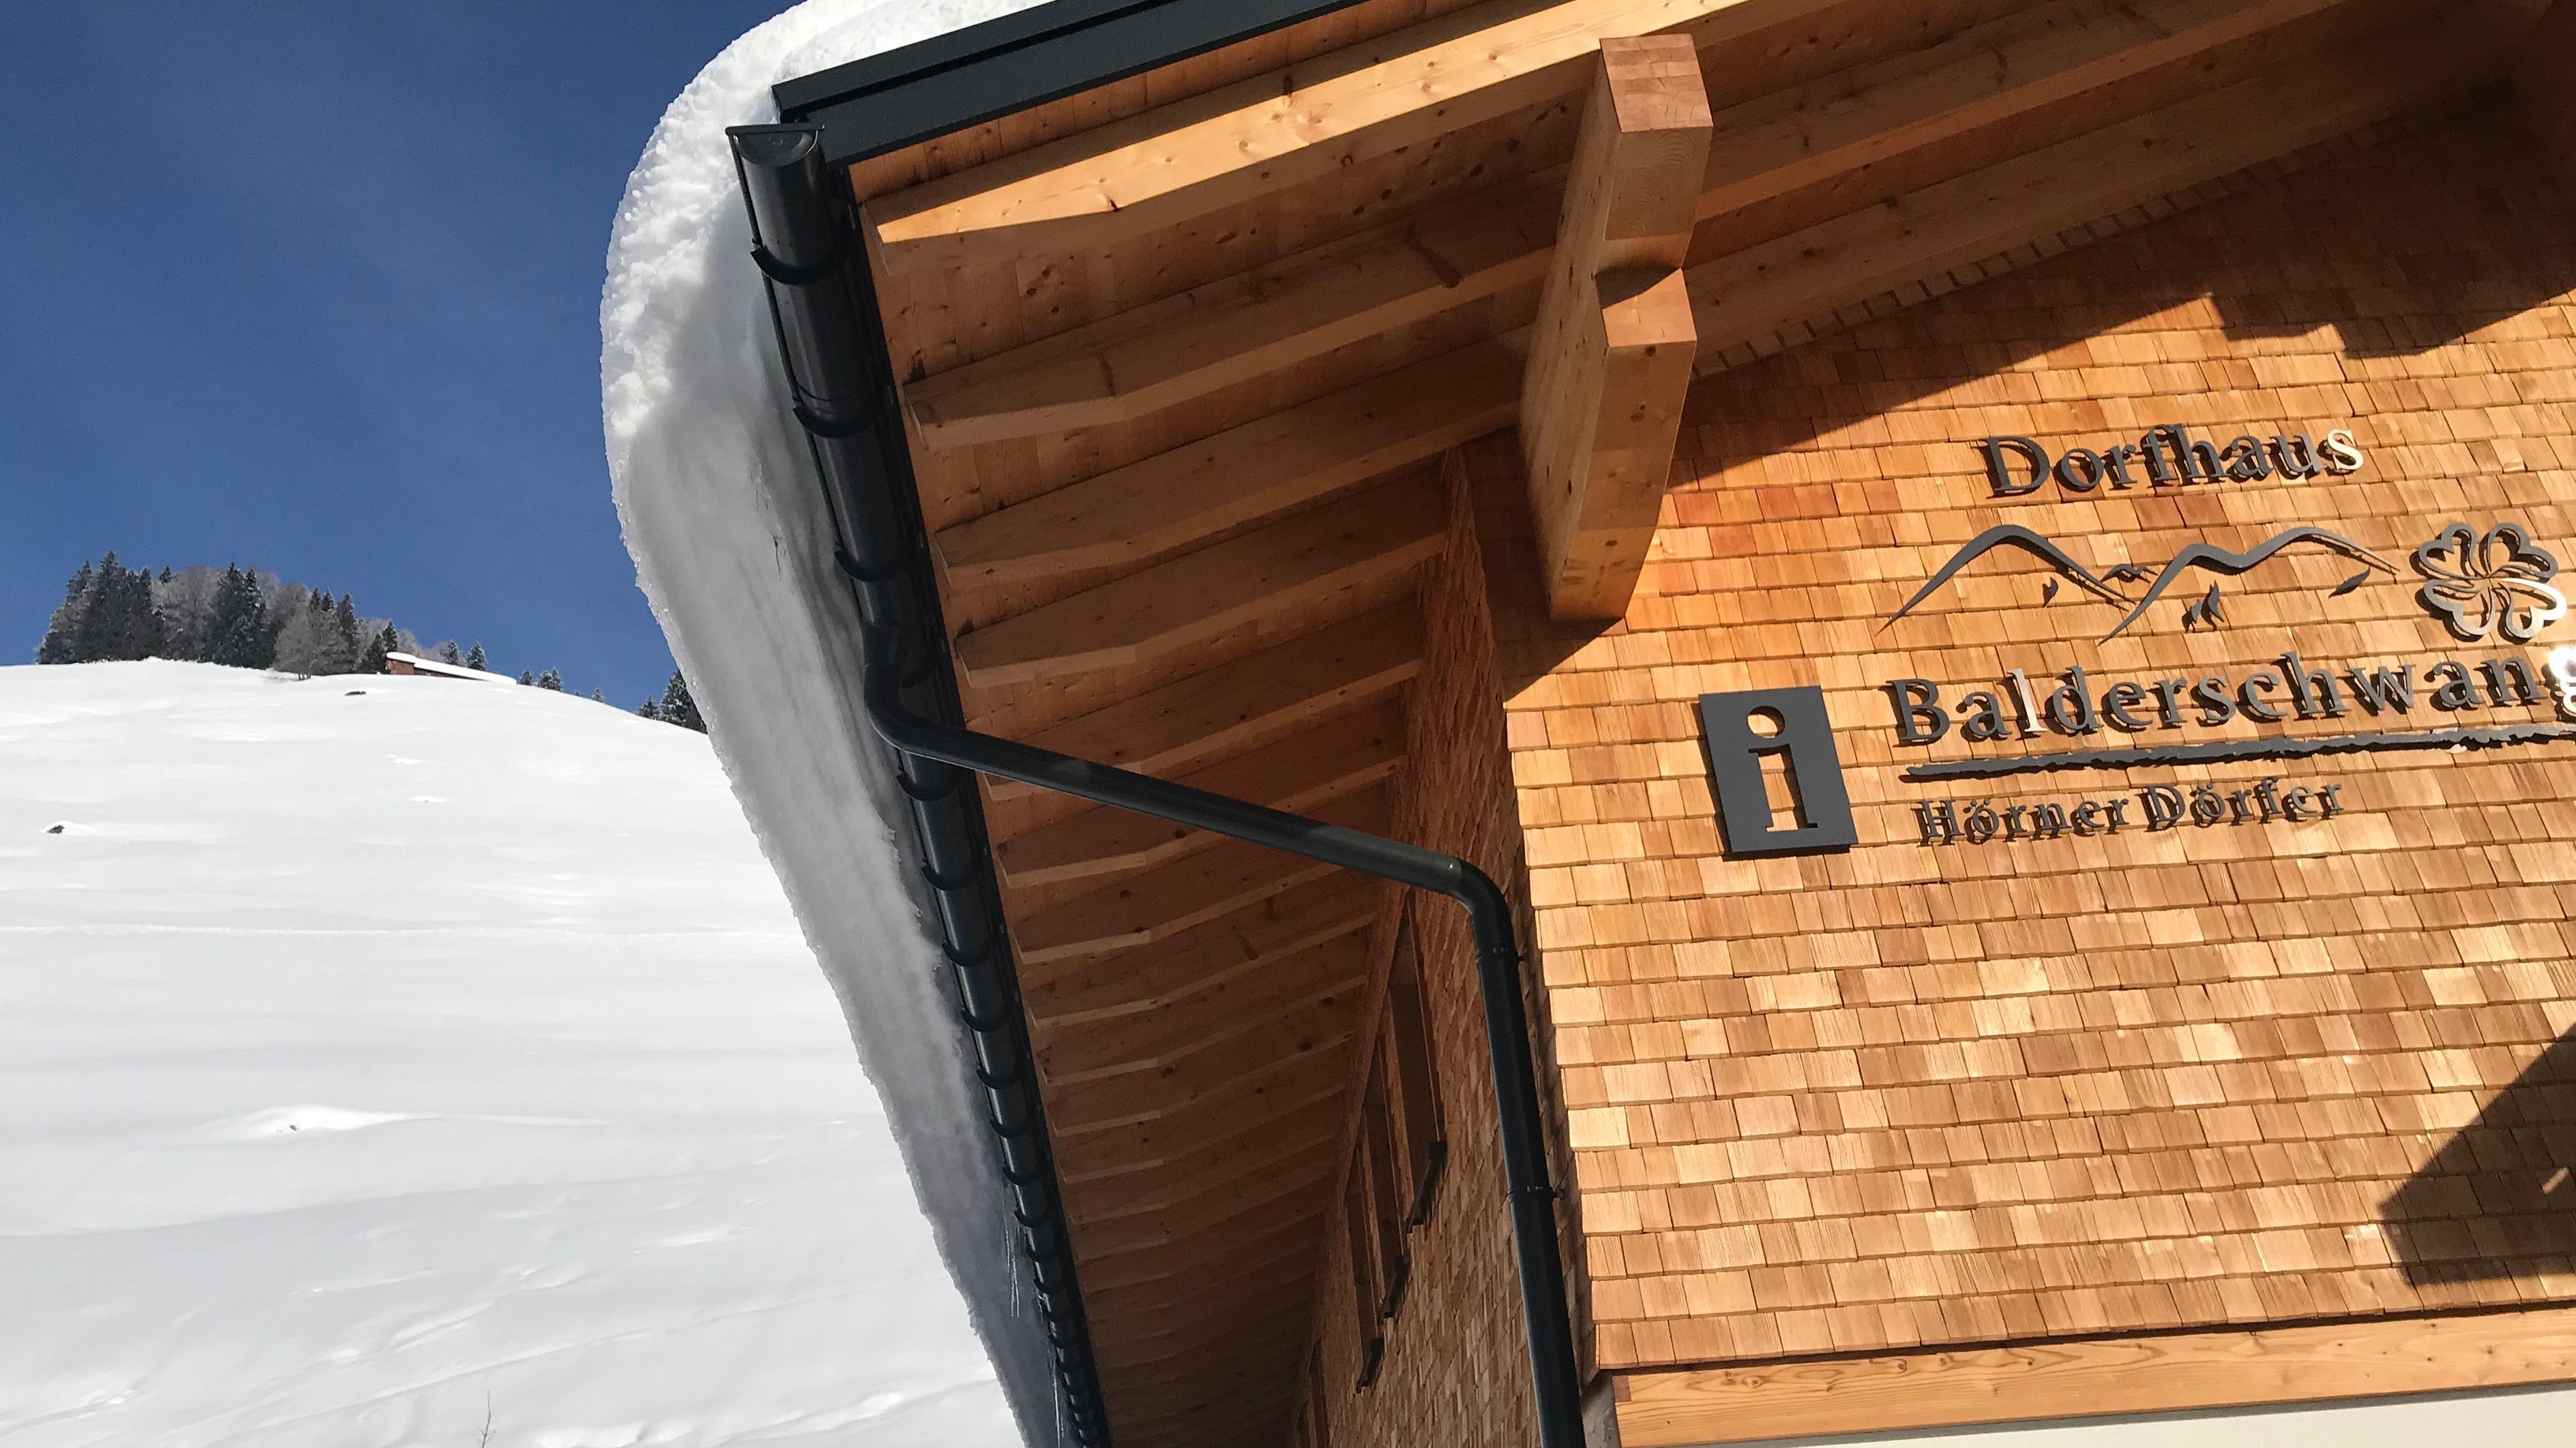 Lawinengefährdet: Das neue Dorfhaus in Balderschwang